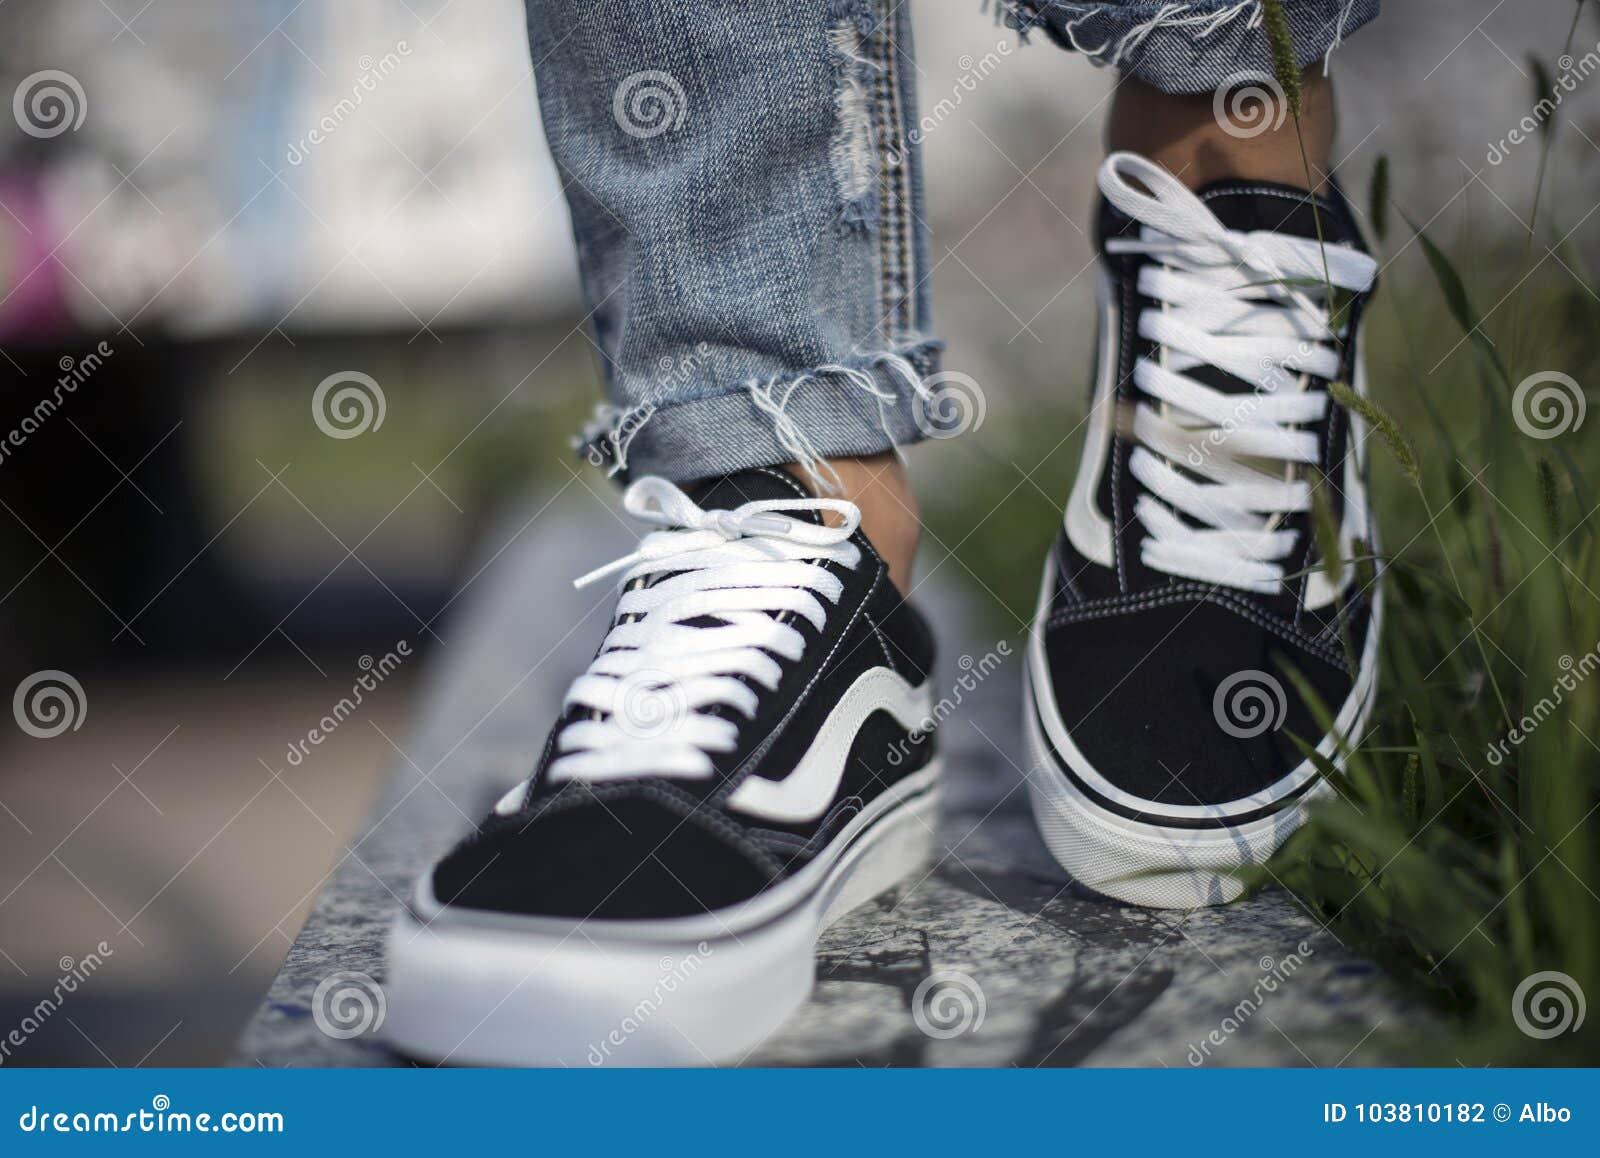 0d9ba6bd19a Milan, Italy - September 28, 2017: Vans Old Skool shoes in the street -  illustrative editorial